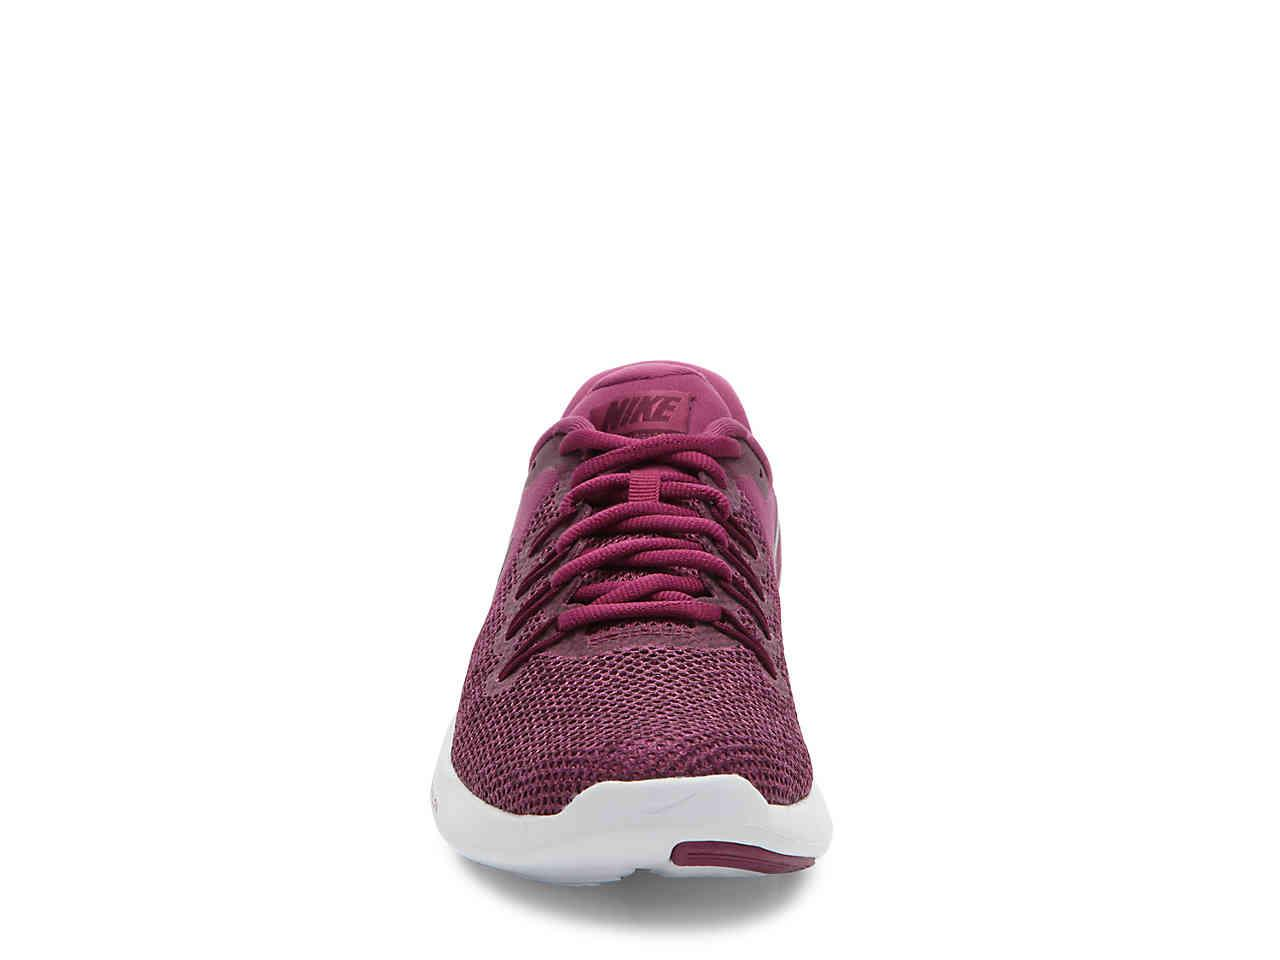 b2cf622f9696 Lyst - Nike Lunar Apparent Lightweight Running Shoe in Purple